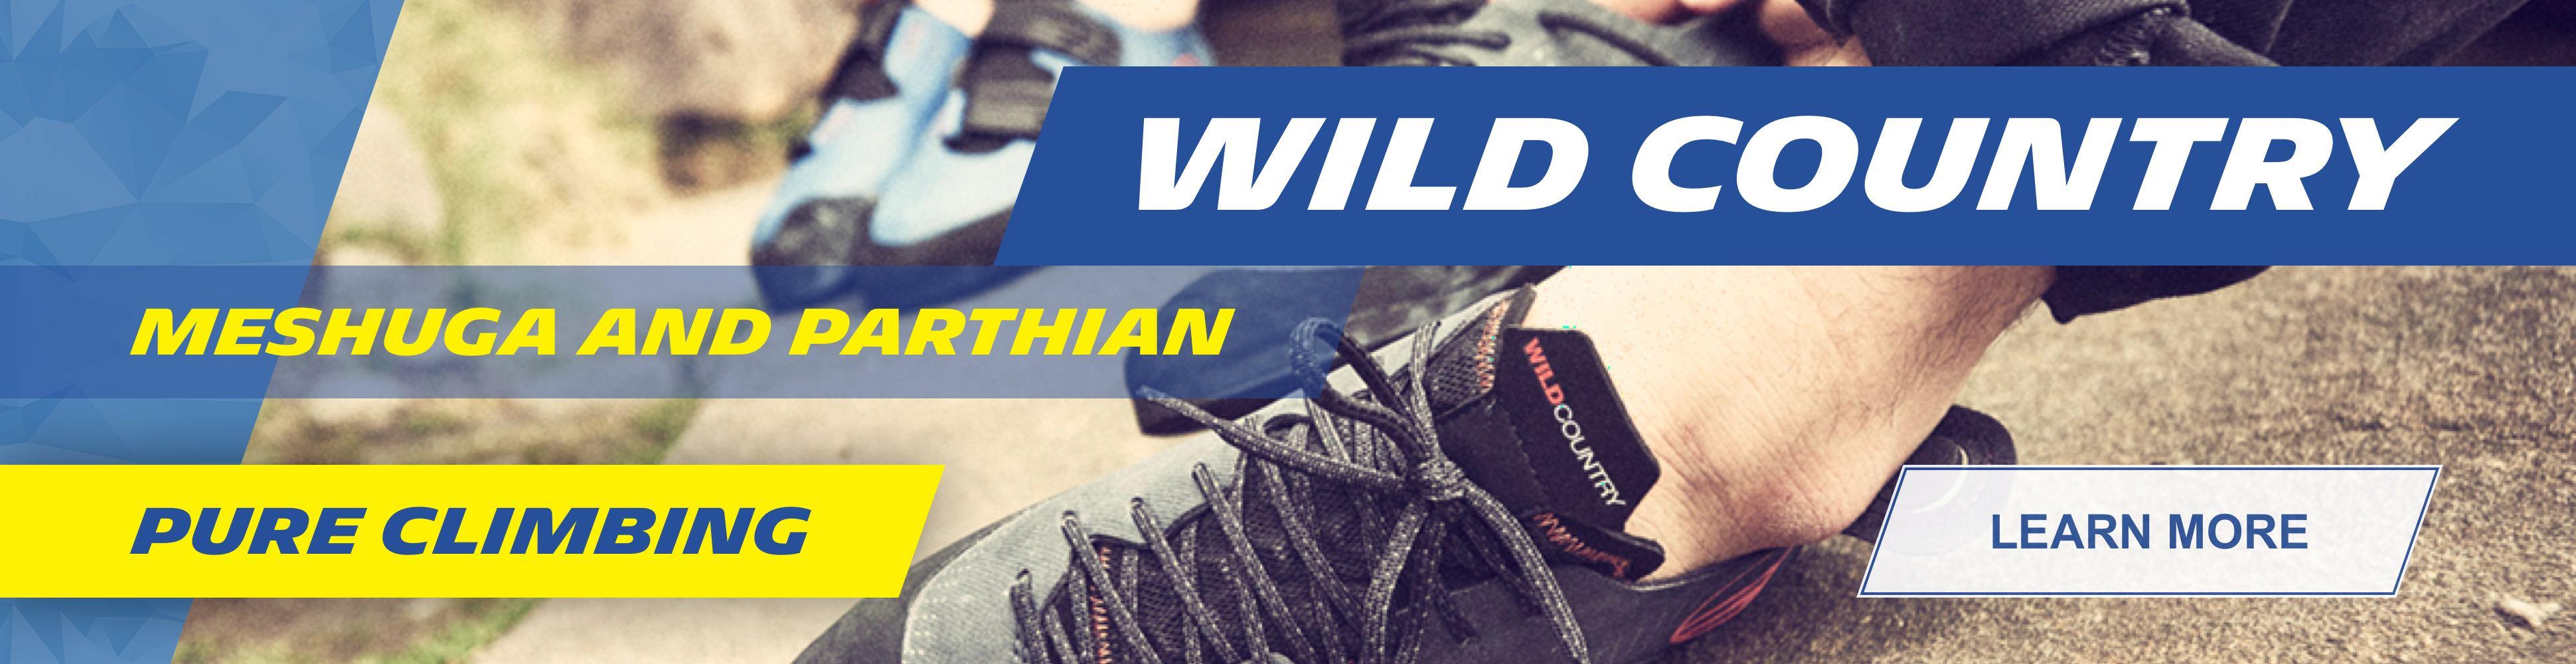 Meshuga and Parthian — Pure Climbing